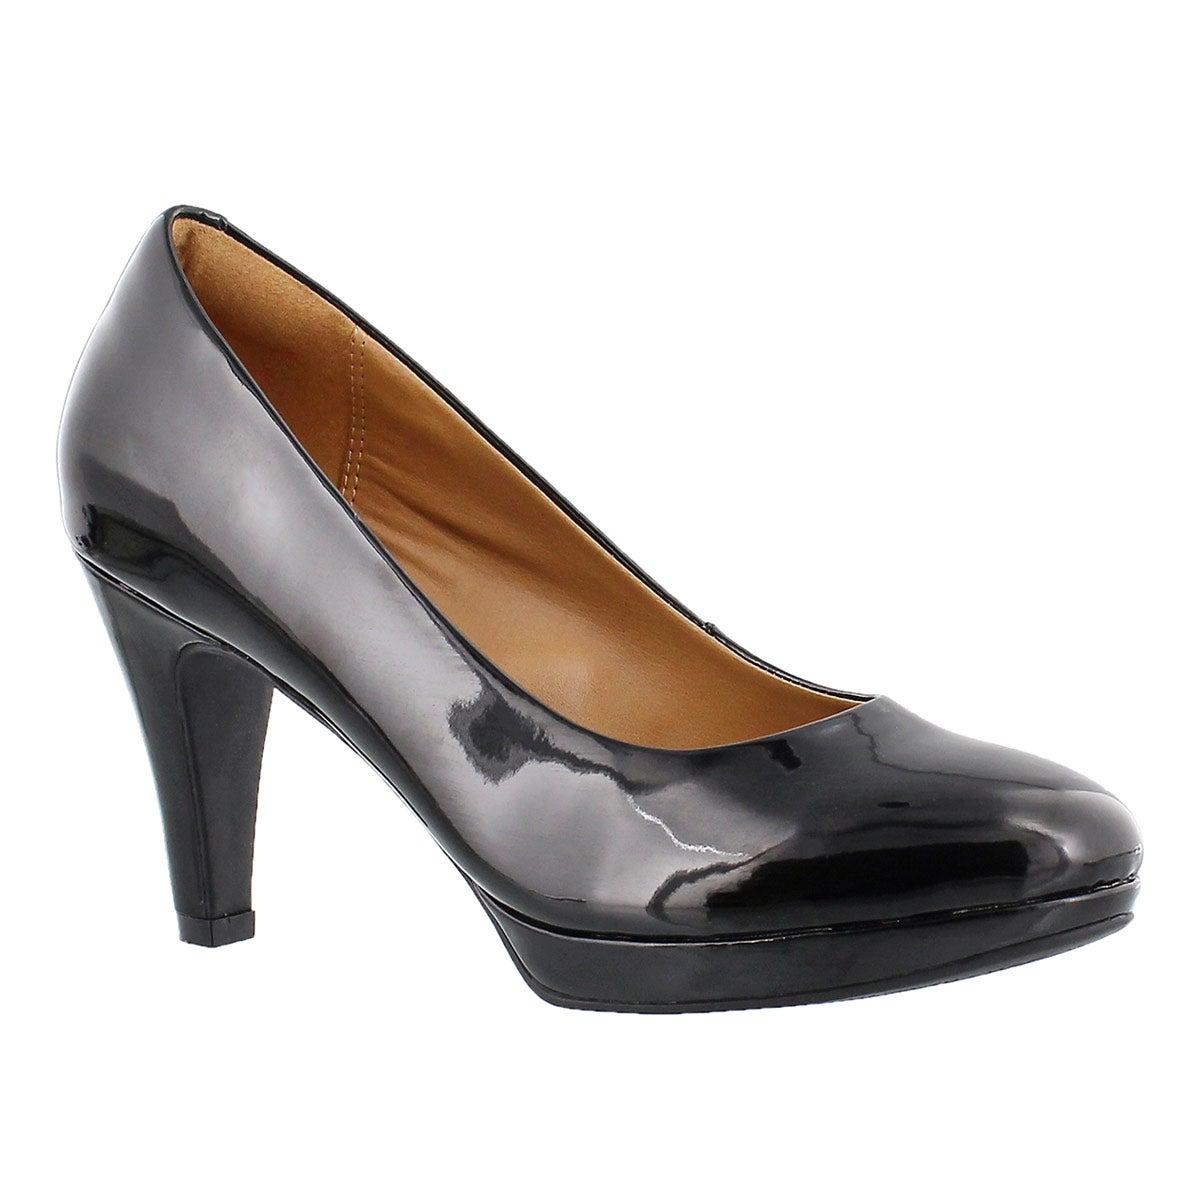 Women's BRIER DOLLY black patent dress heels